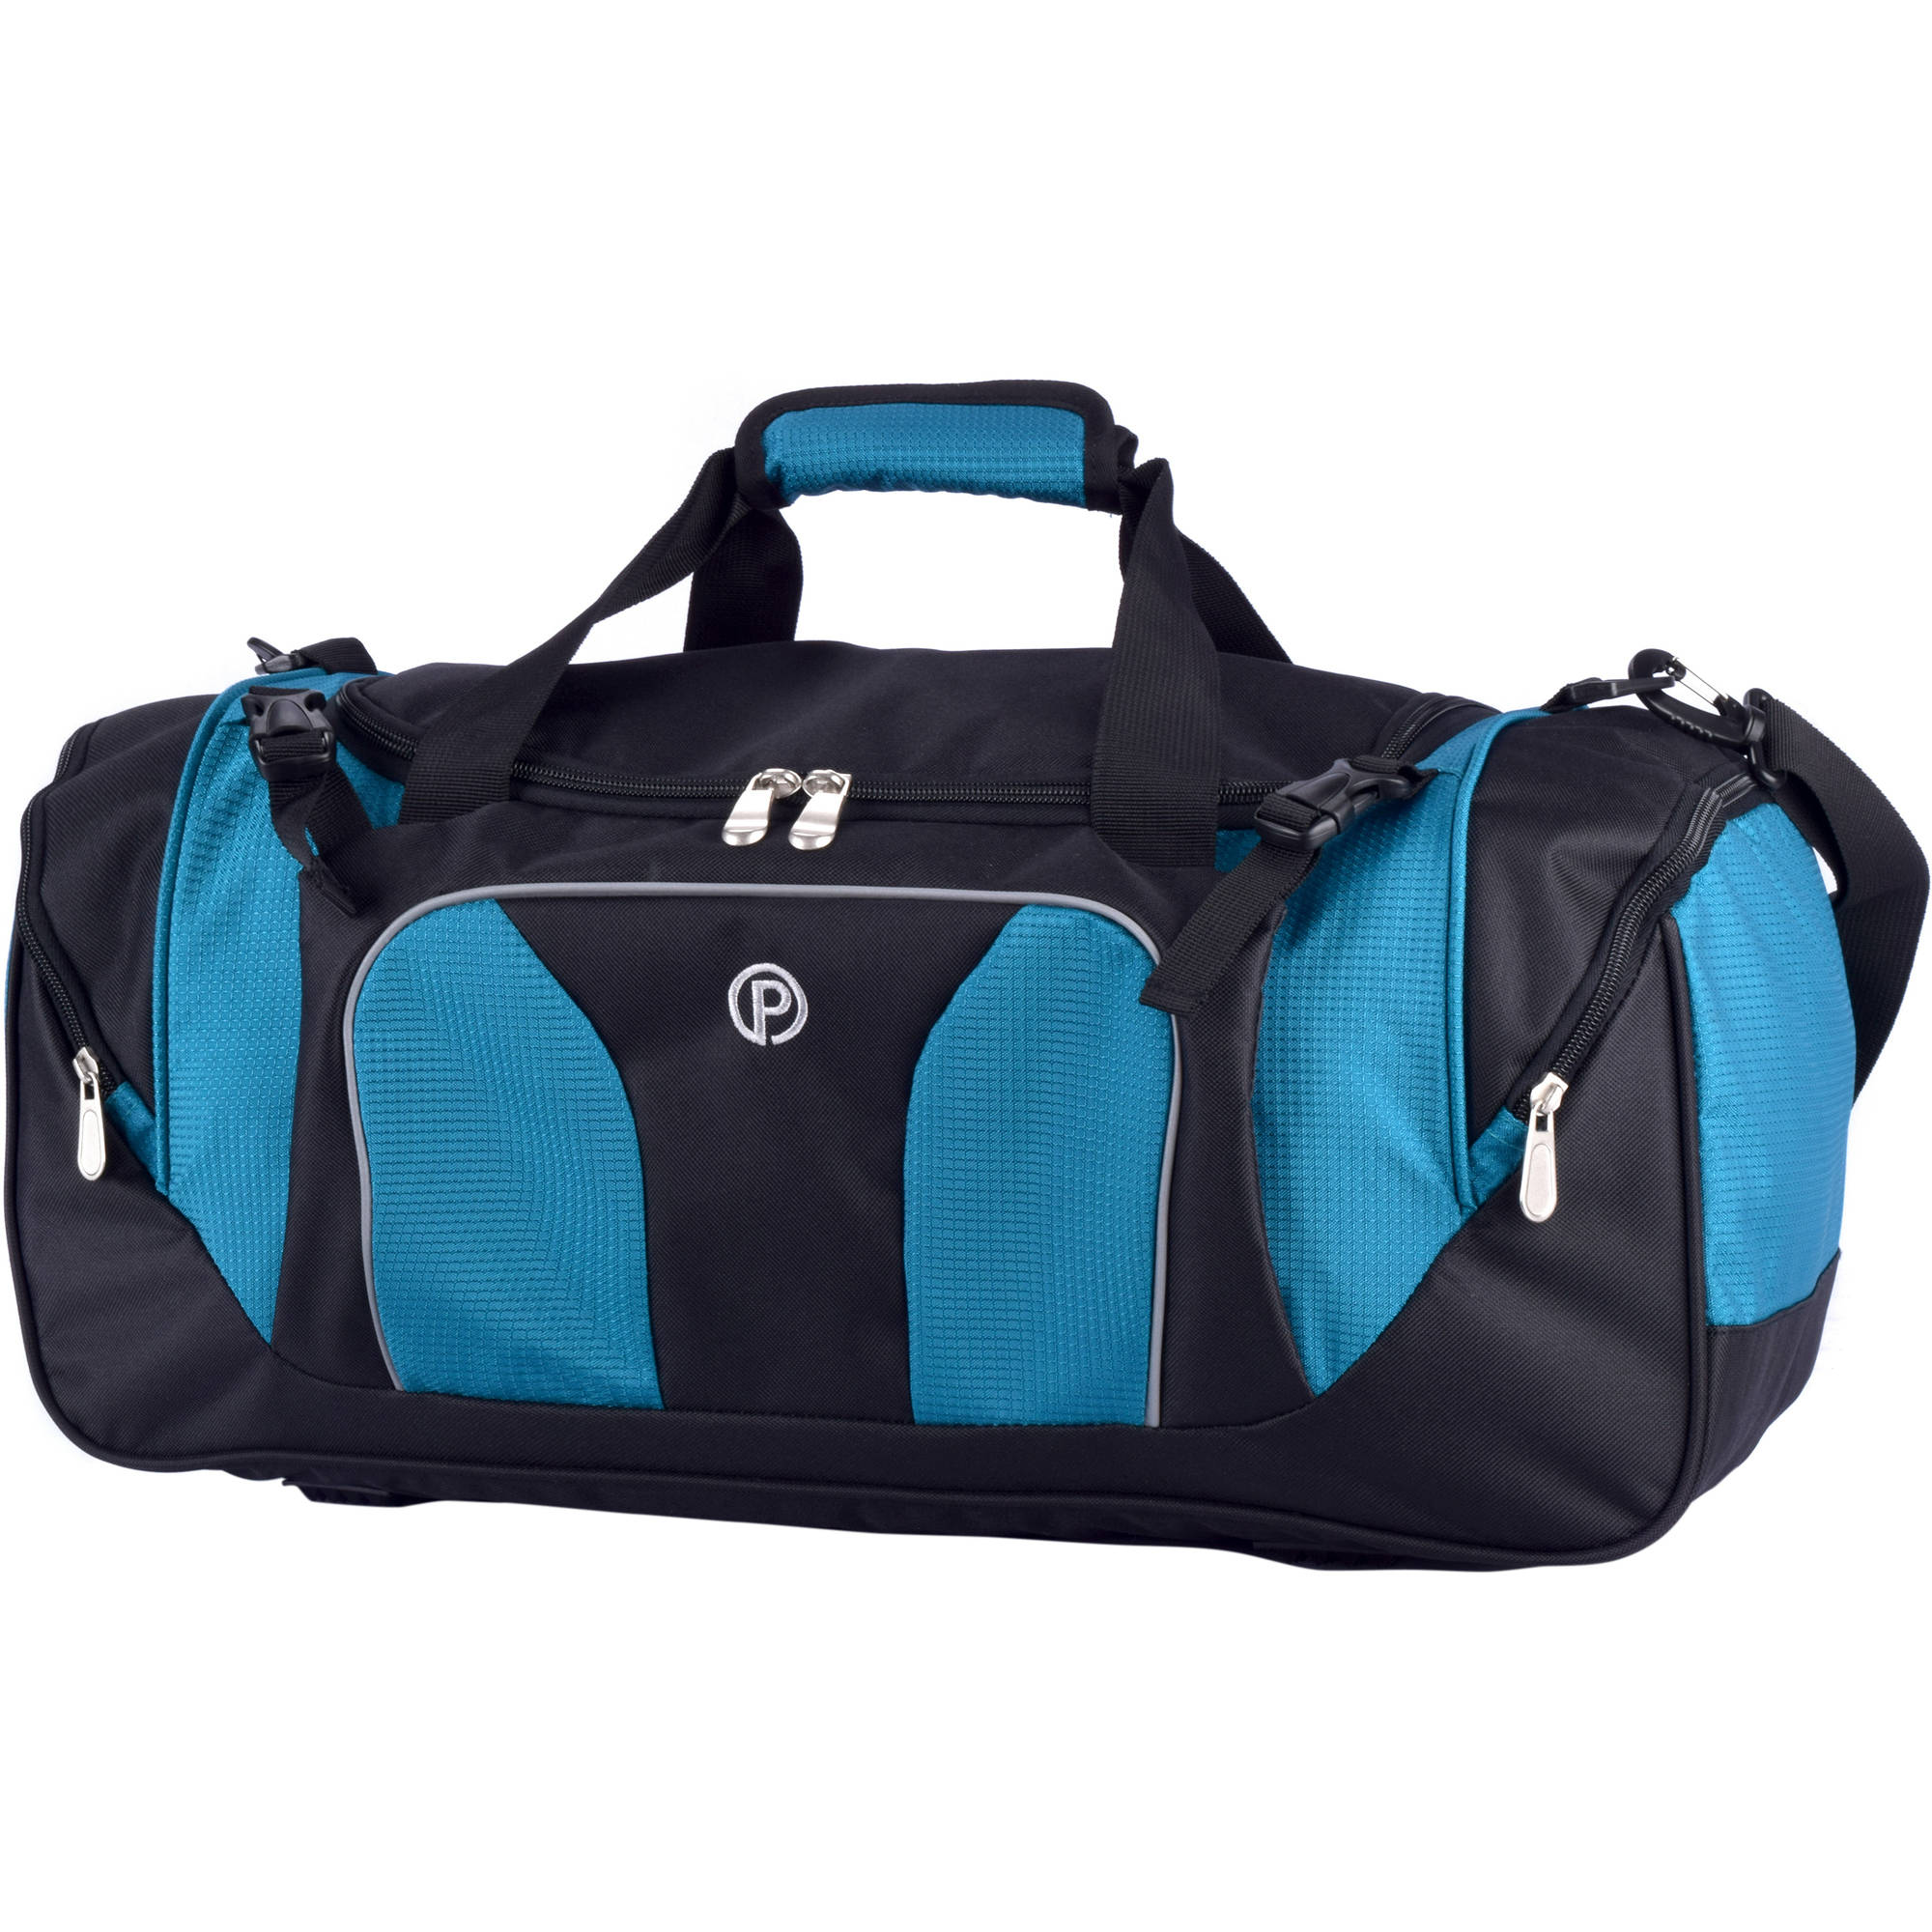 "Protege 22"" Sport Duffel Aqua by Travelers Club Luggage"